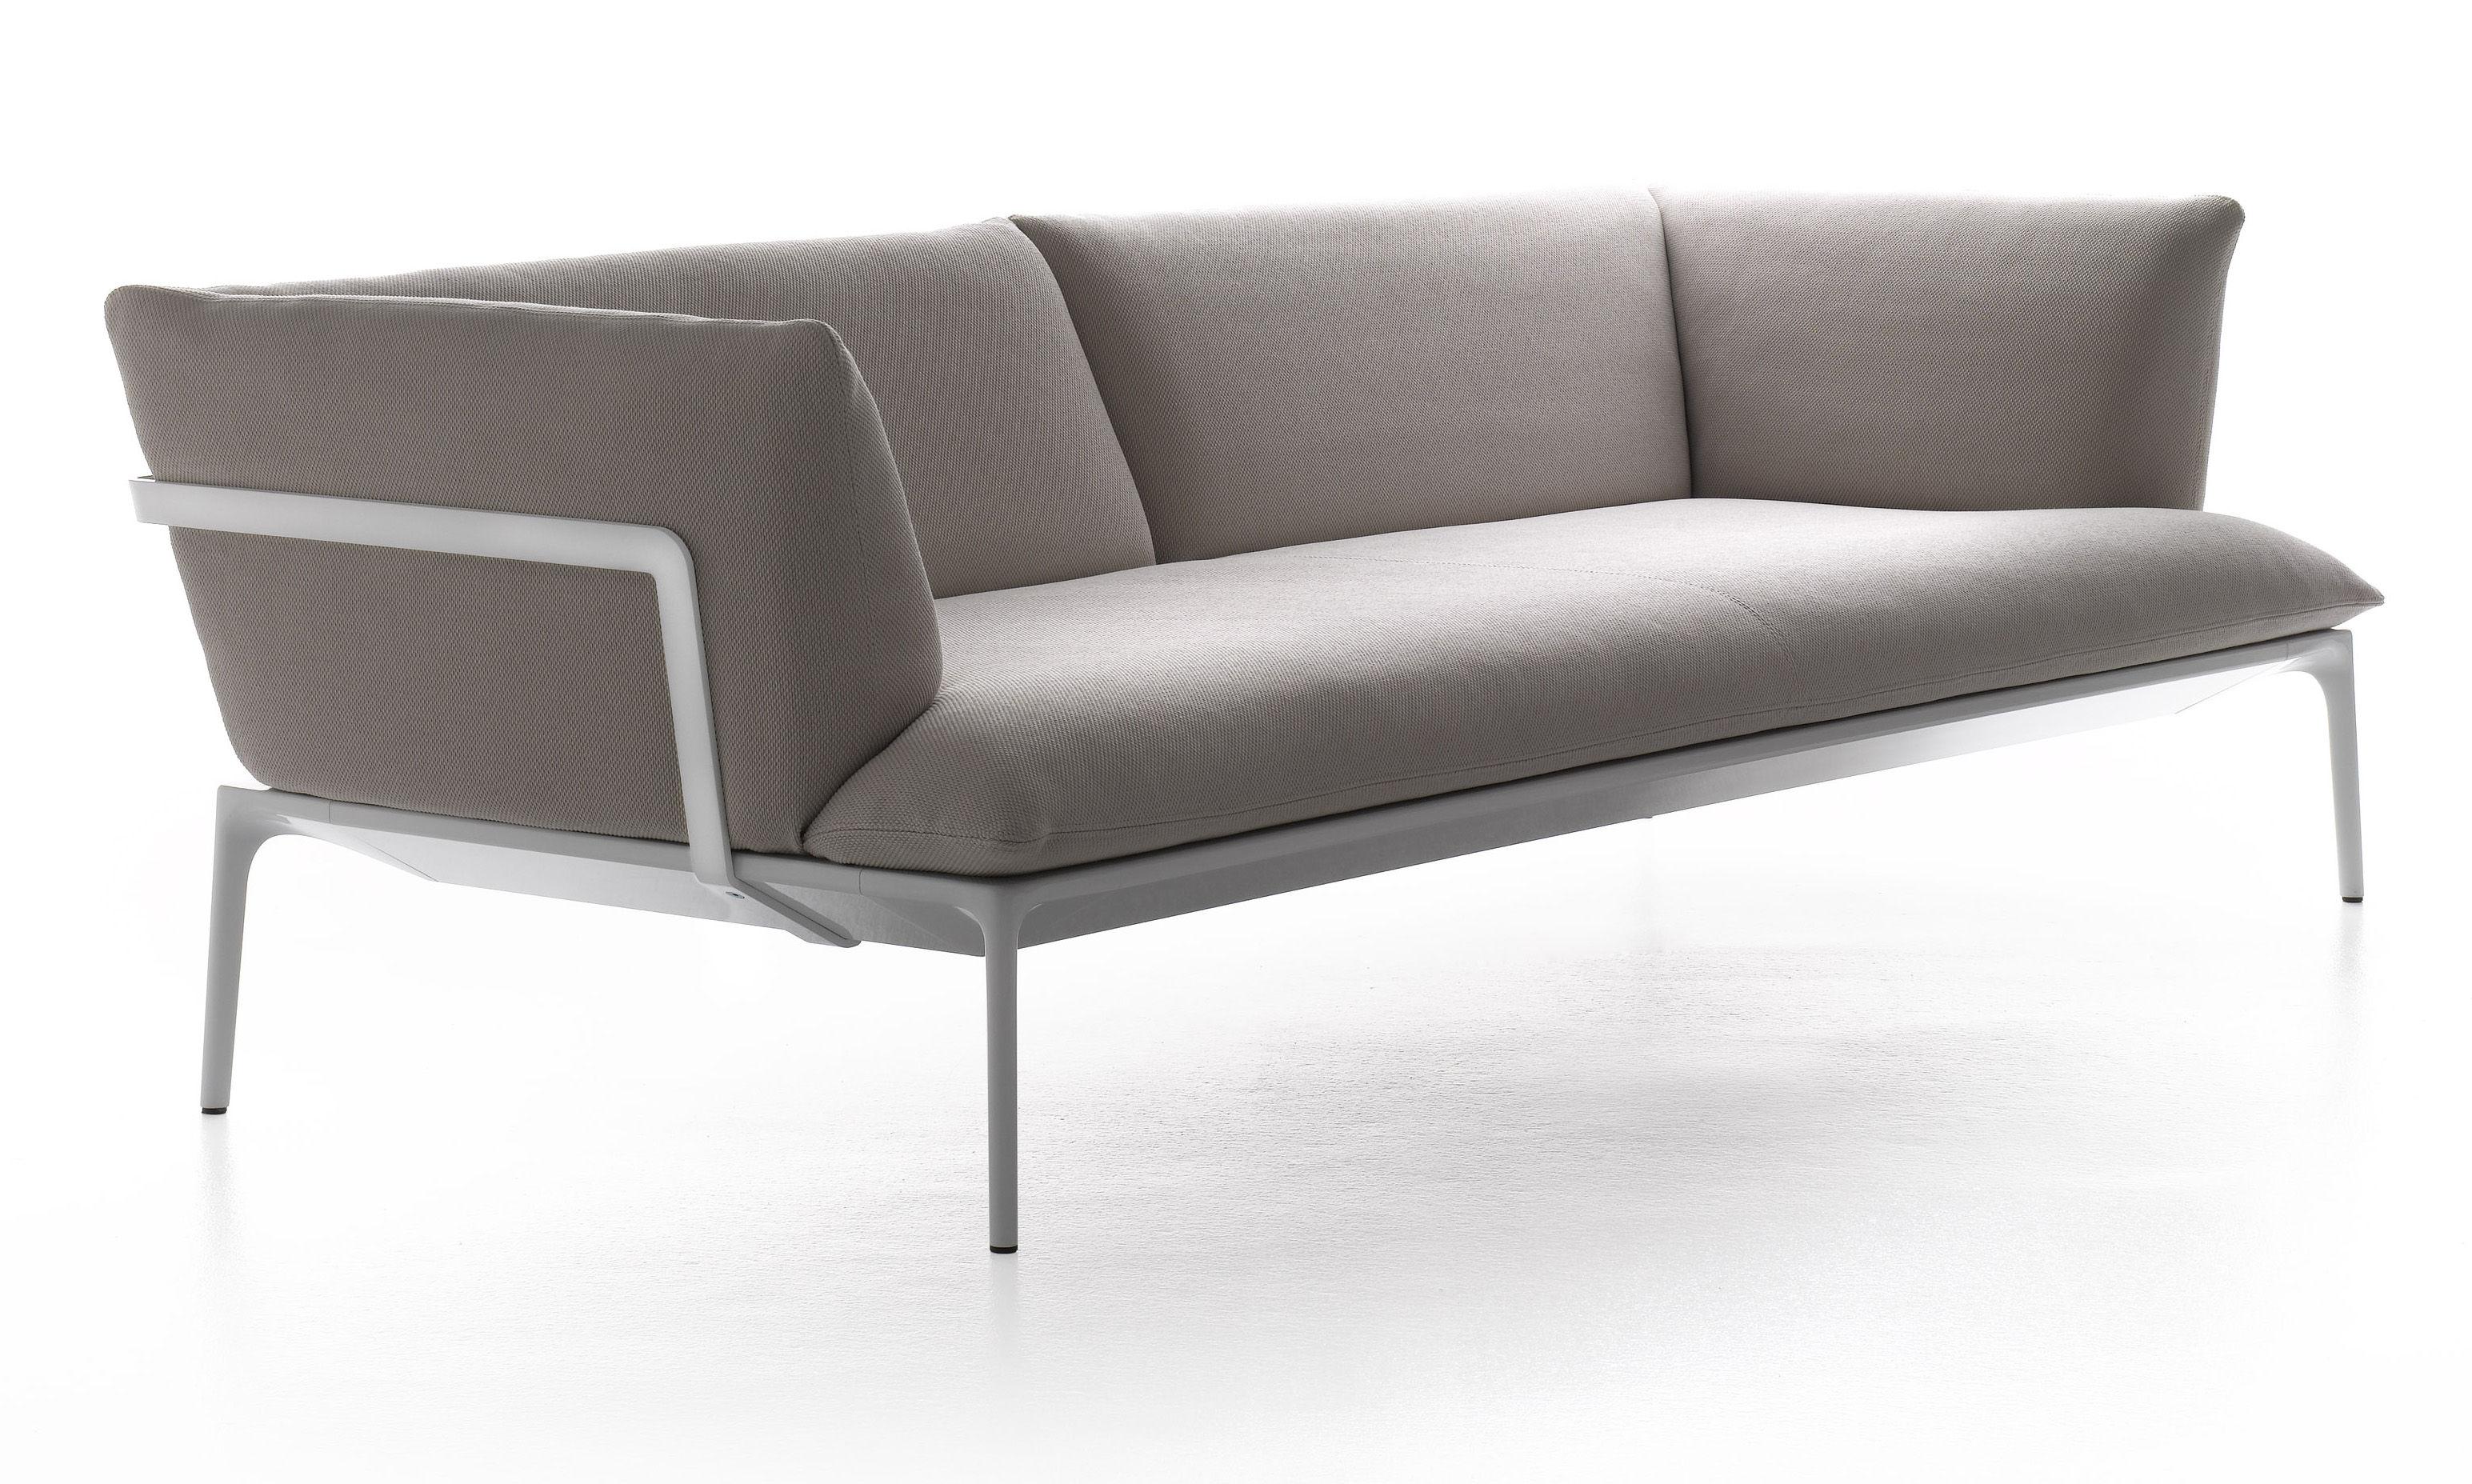 yale 3 sitzer l 220 cm mdf italia sofa. Black Bedroom Furniture Sets. Home Design Ideas